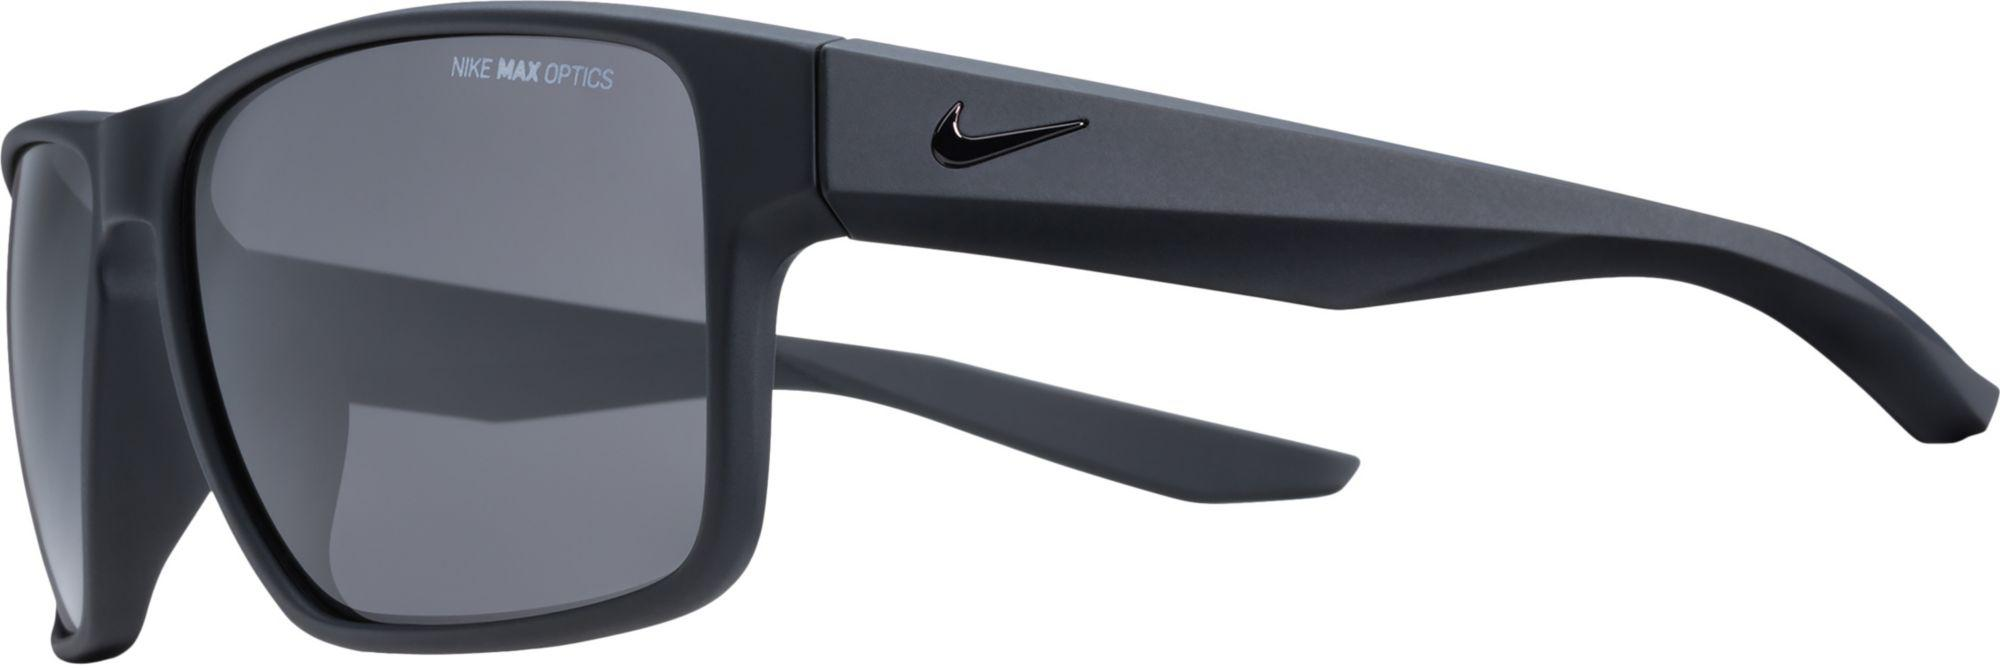 1ce046917695 Nike - Gray Essential Venture Sunglasses for Men - Lyst. View fullscreen